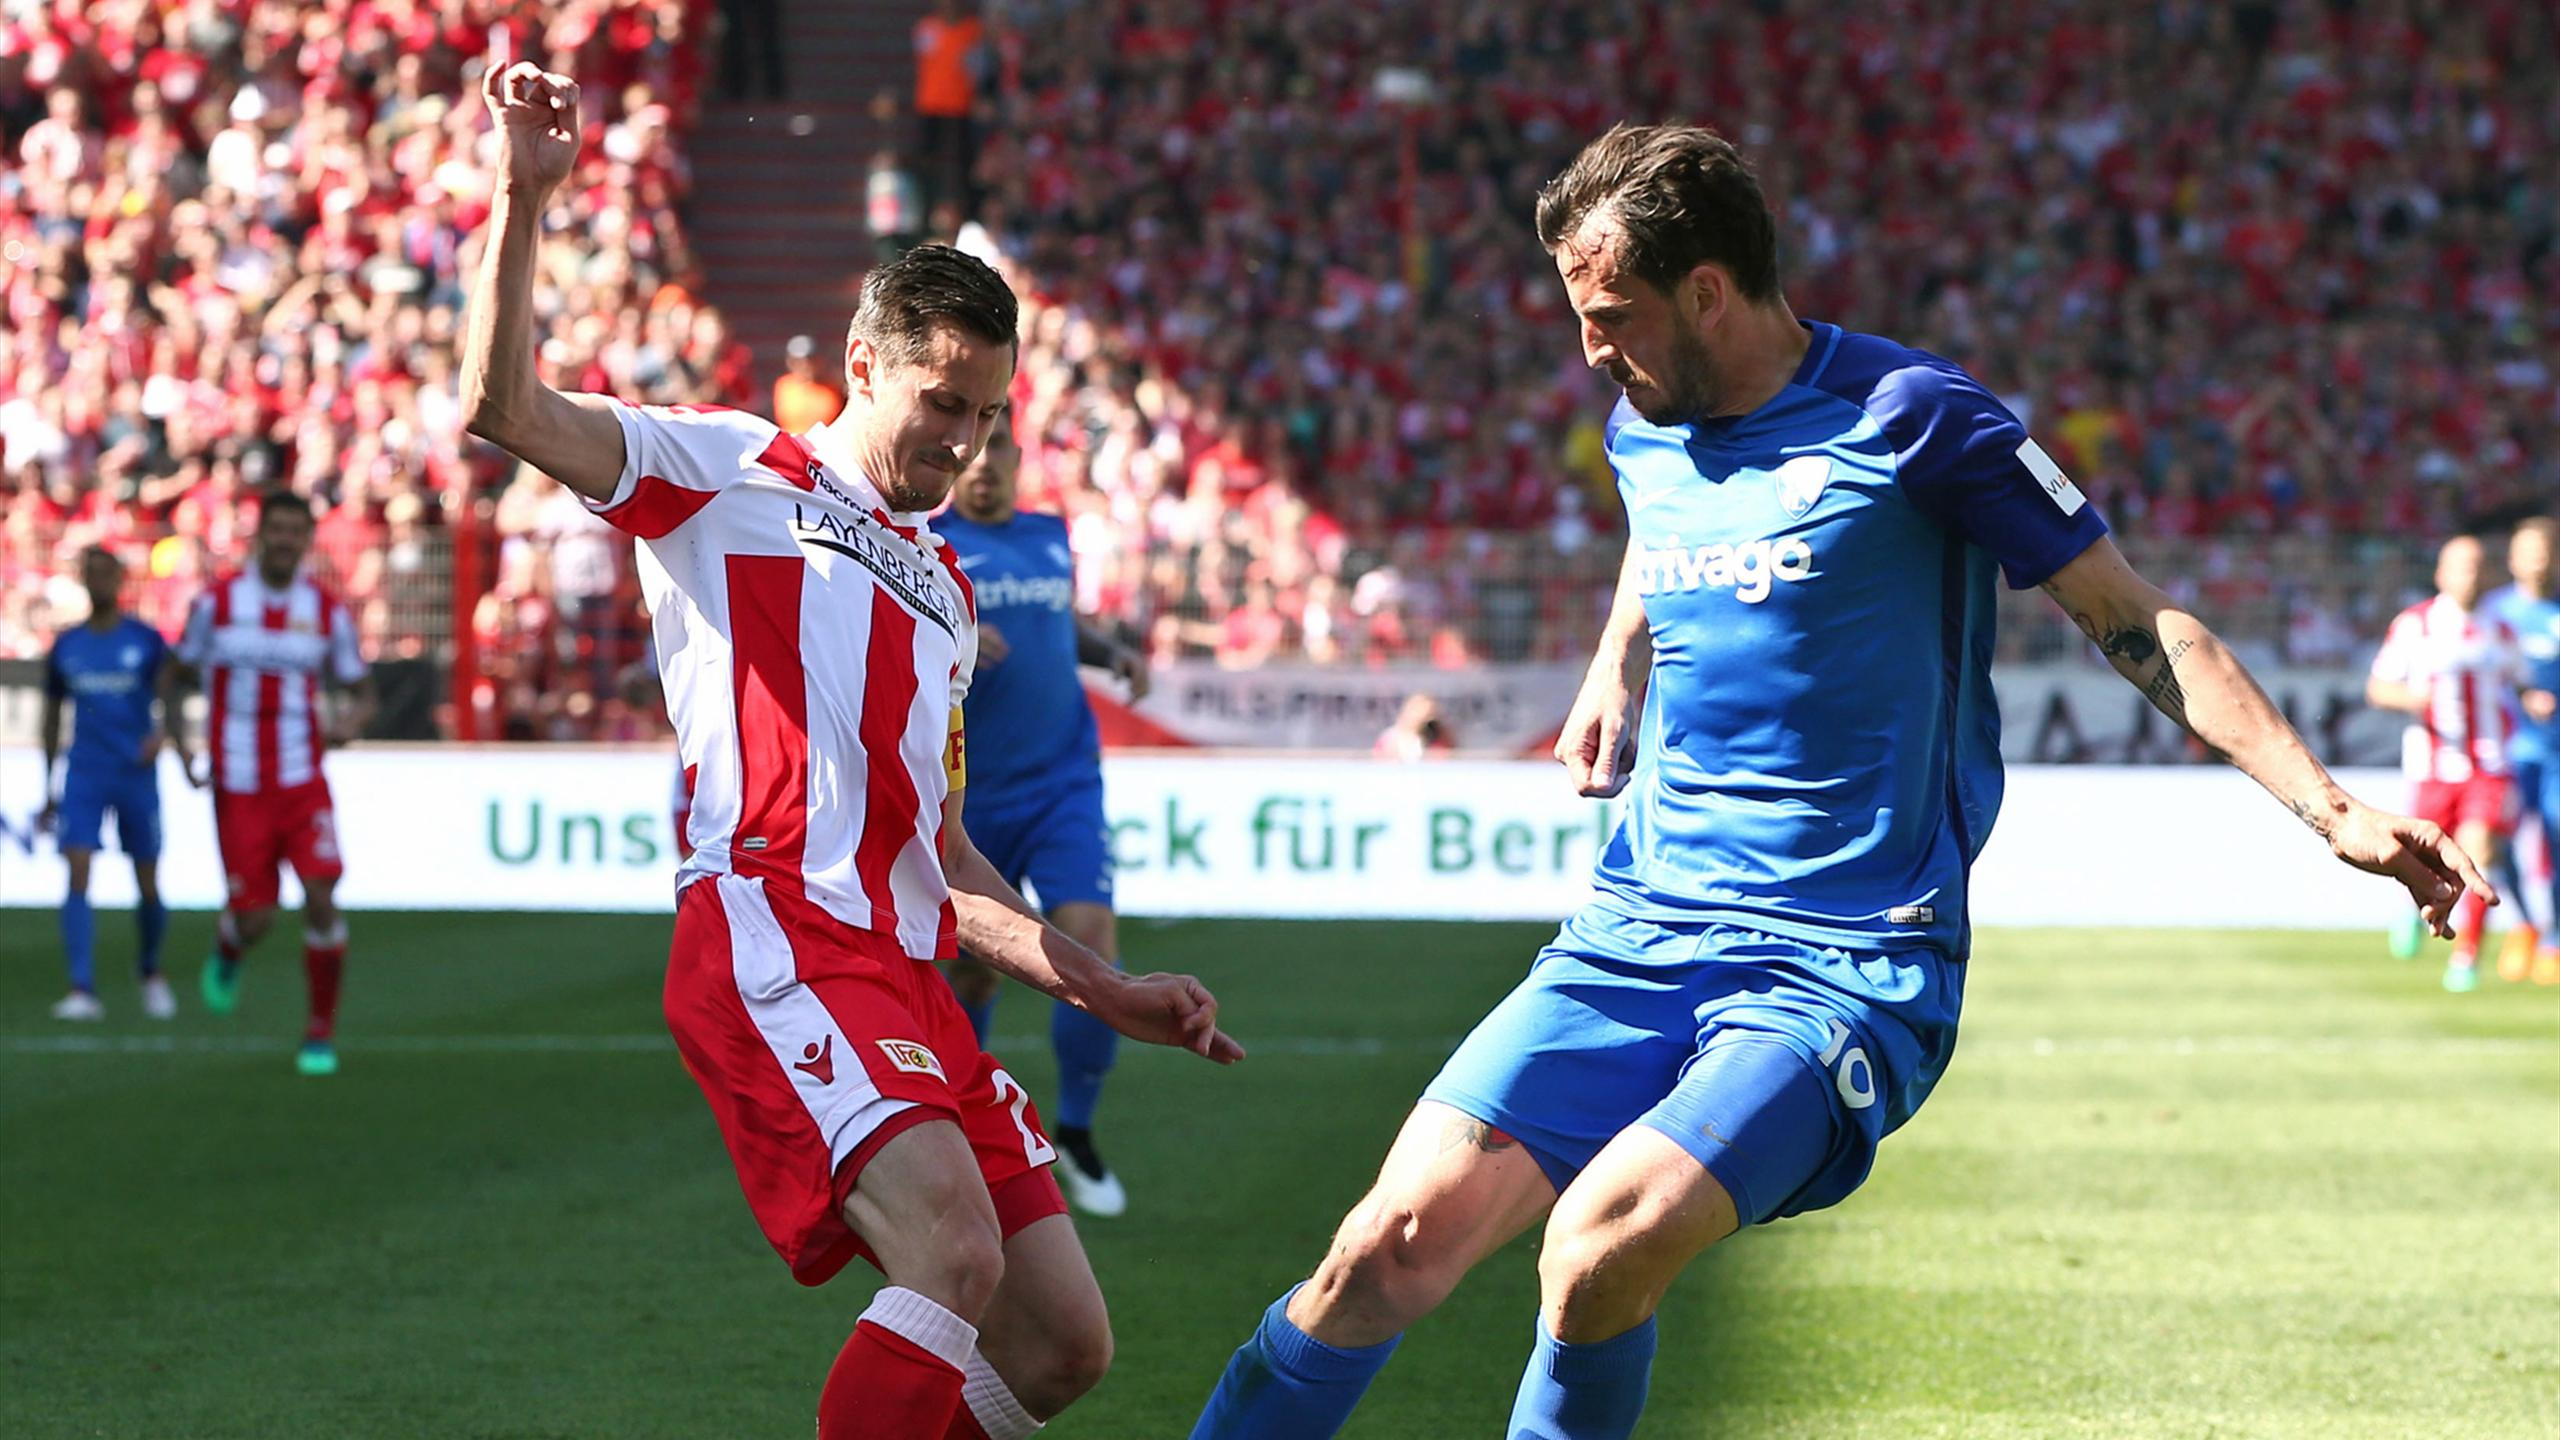 Schalke Gegen Berlin 2017